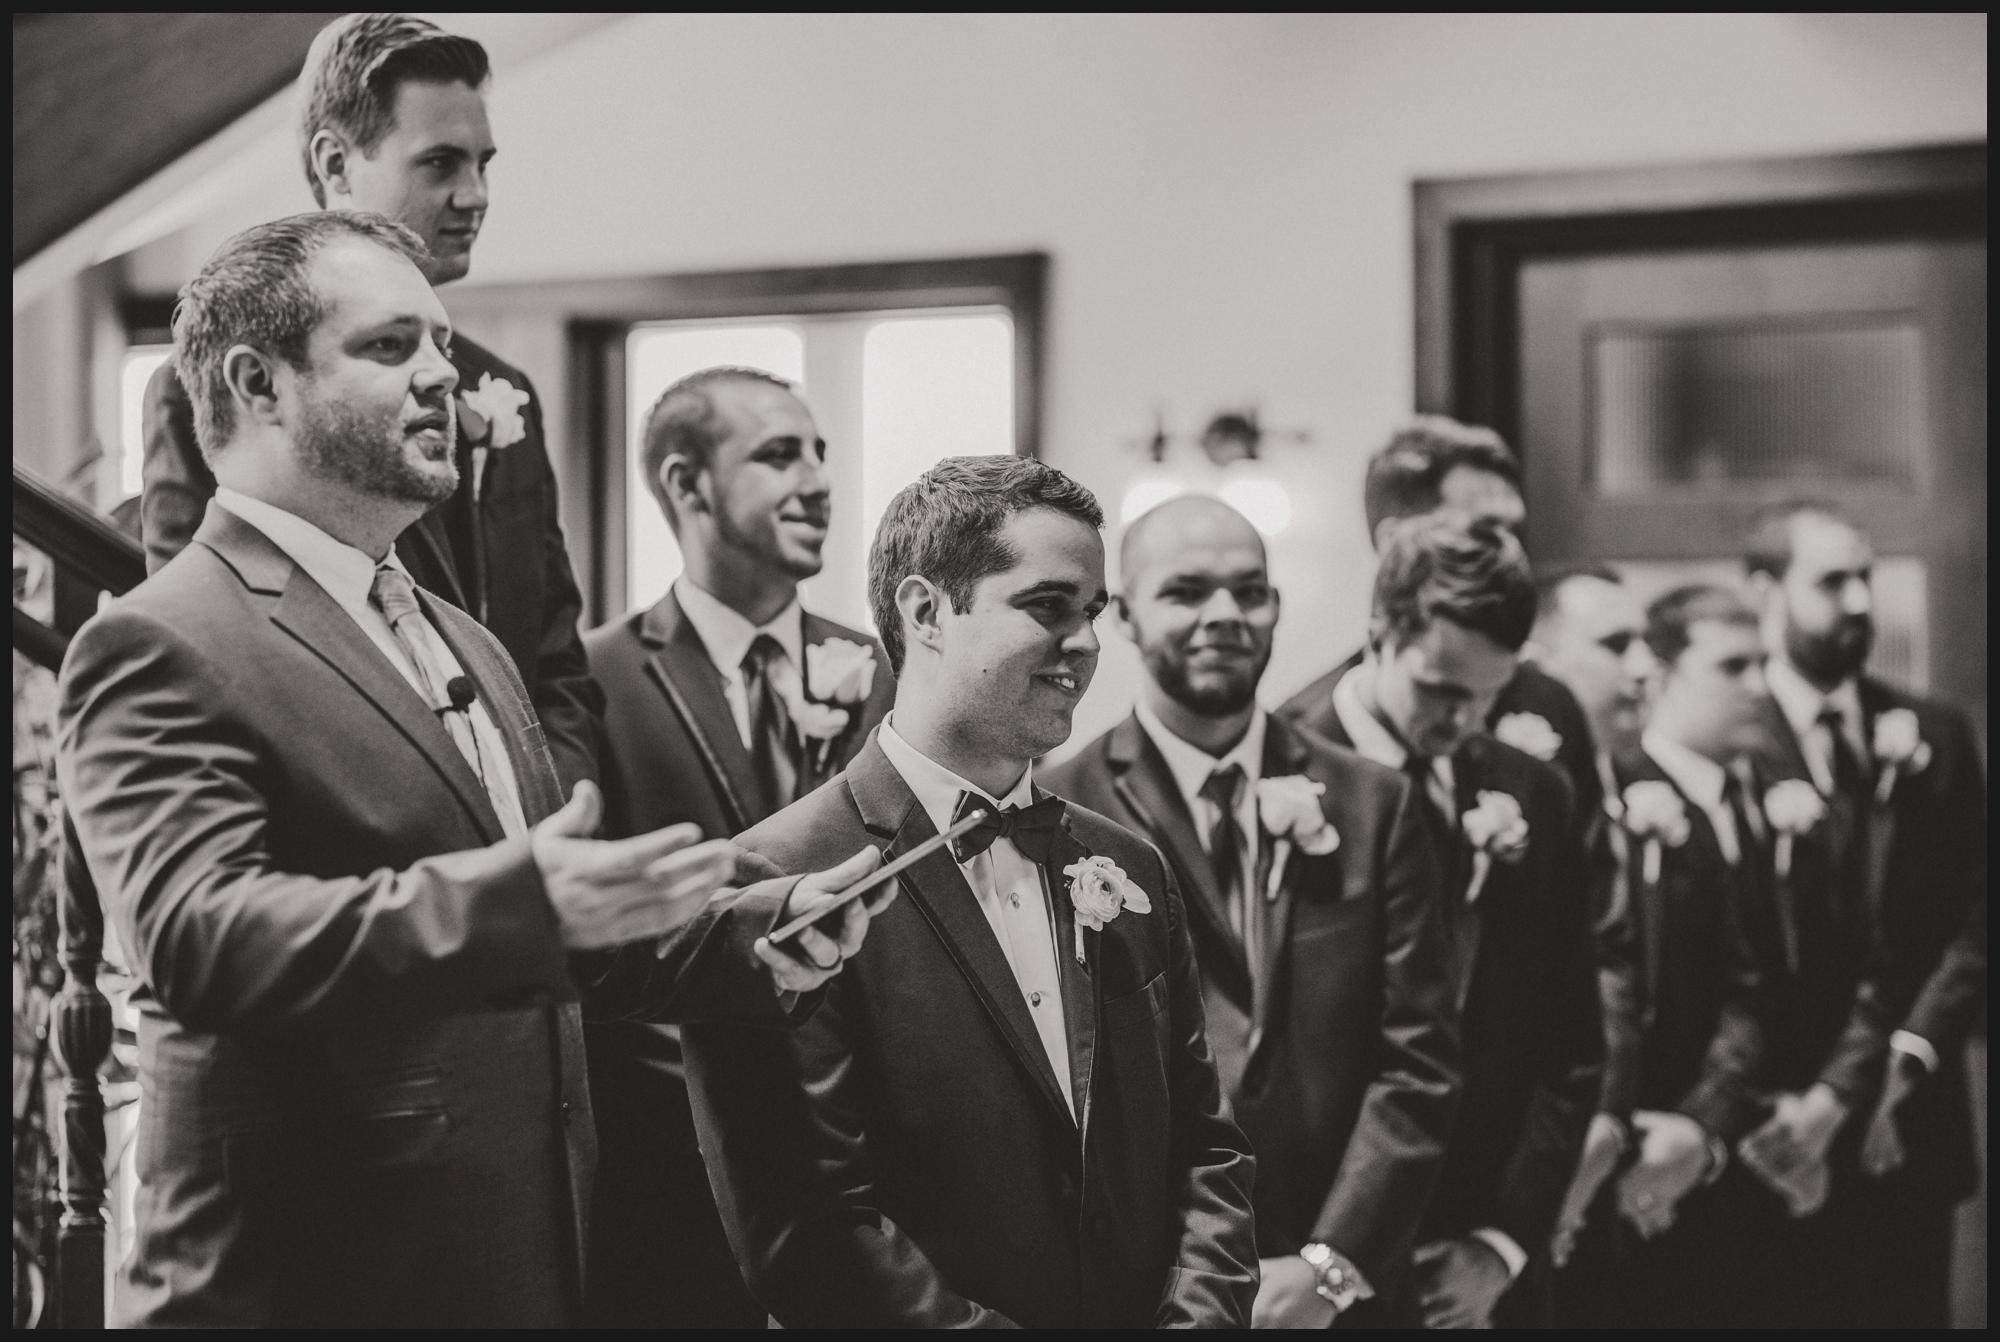 Orlando-Wedding-Photographer-destination-wedding-photographer-florida-wedding-photographer-bohemian-wedding-photographer_0271.jpg